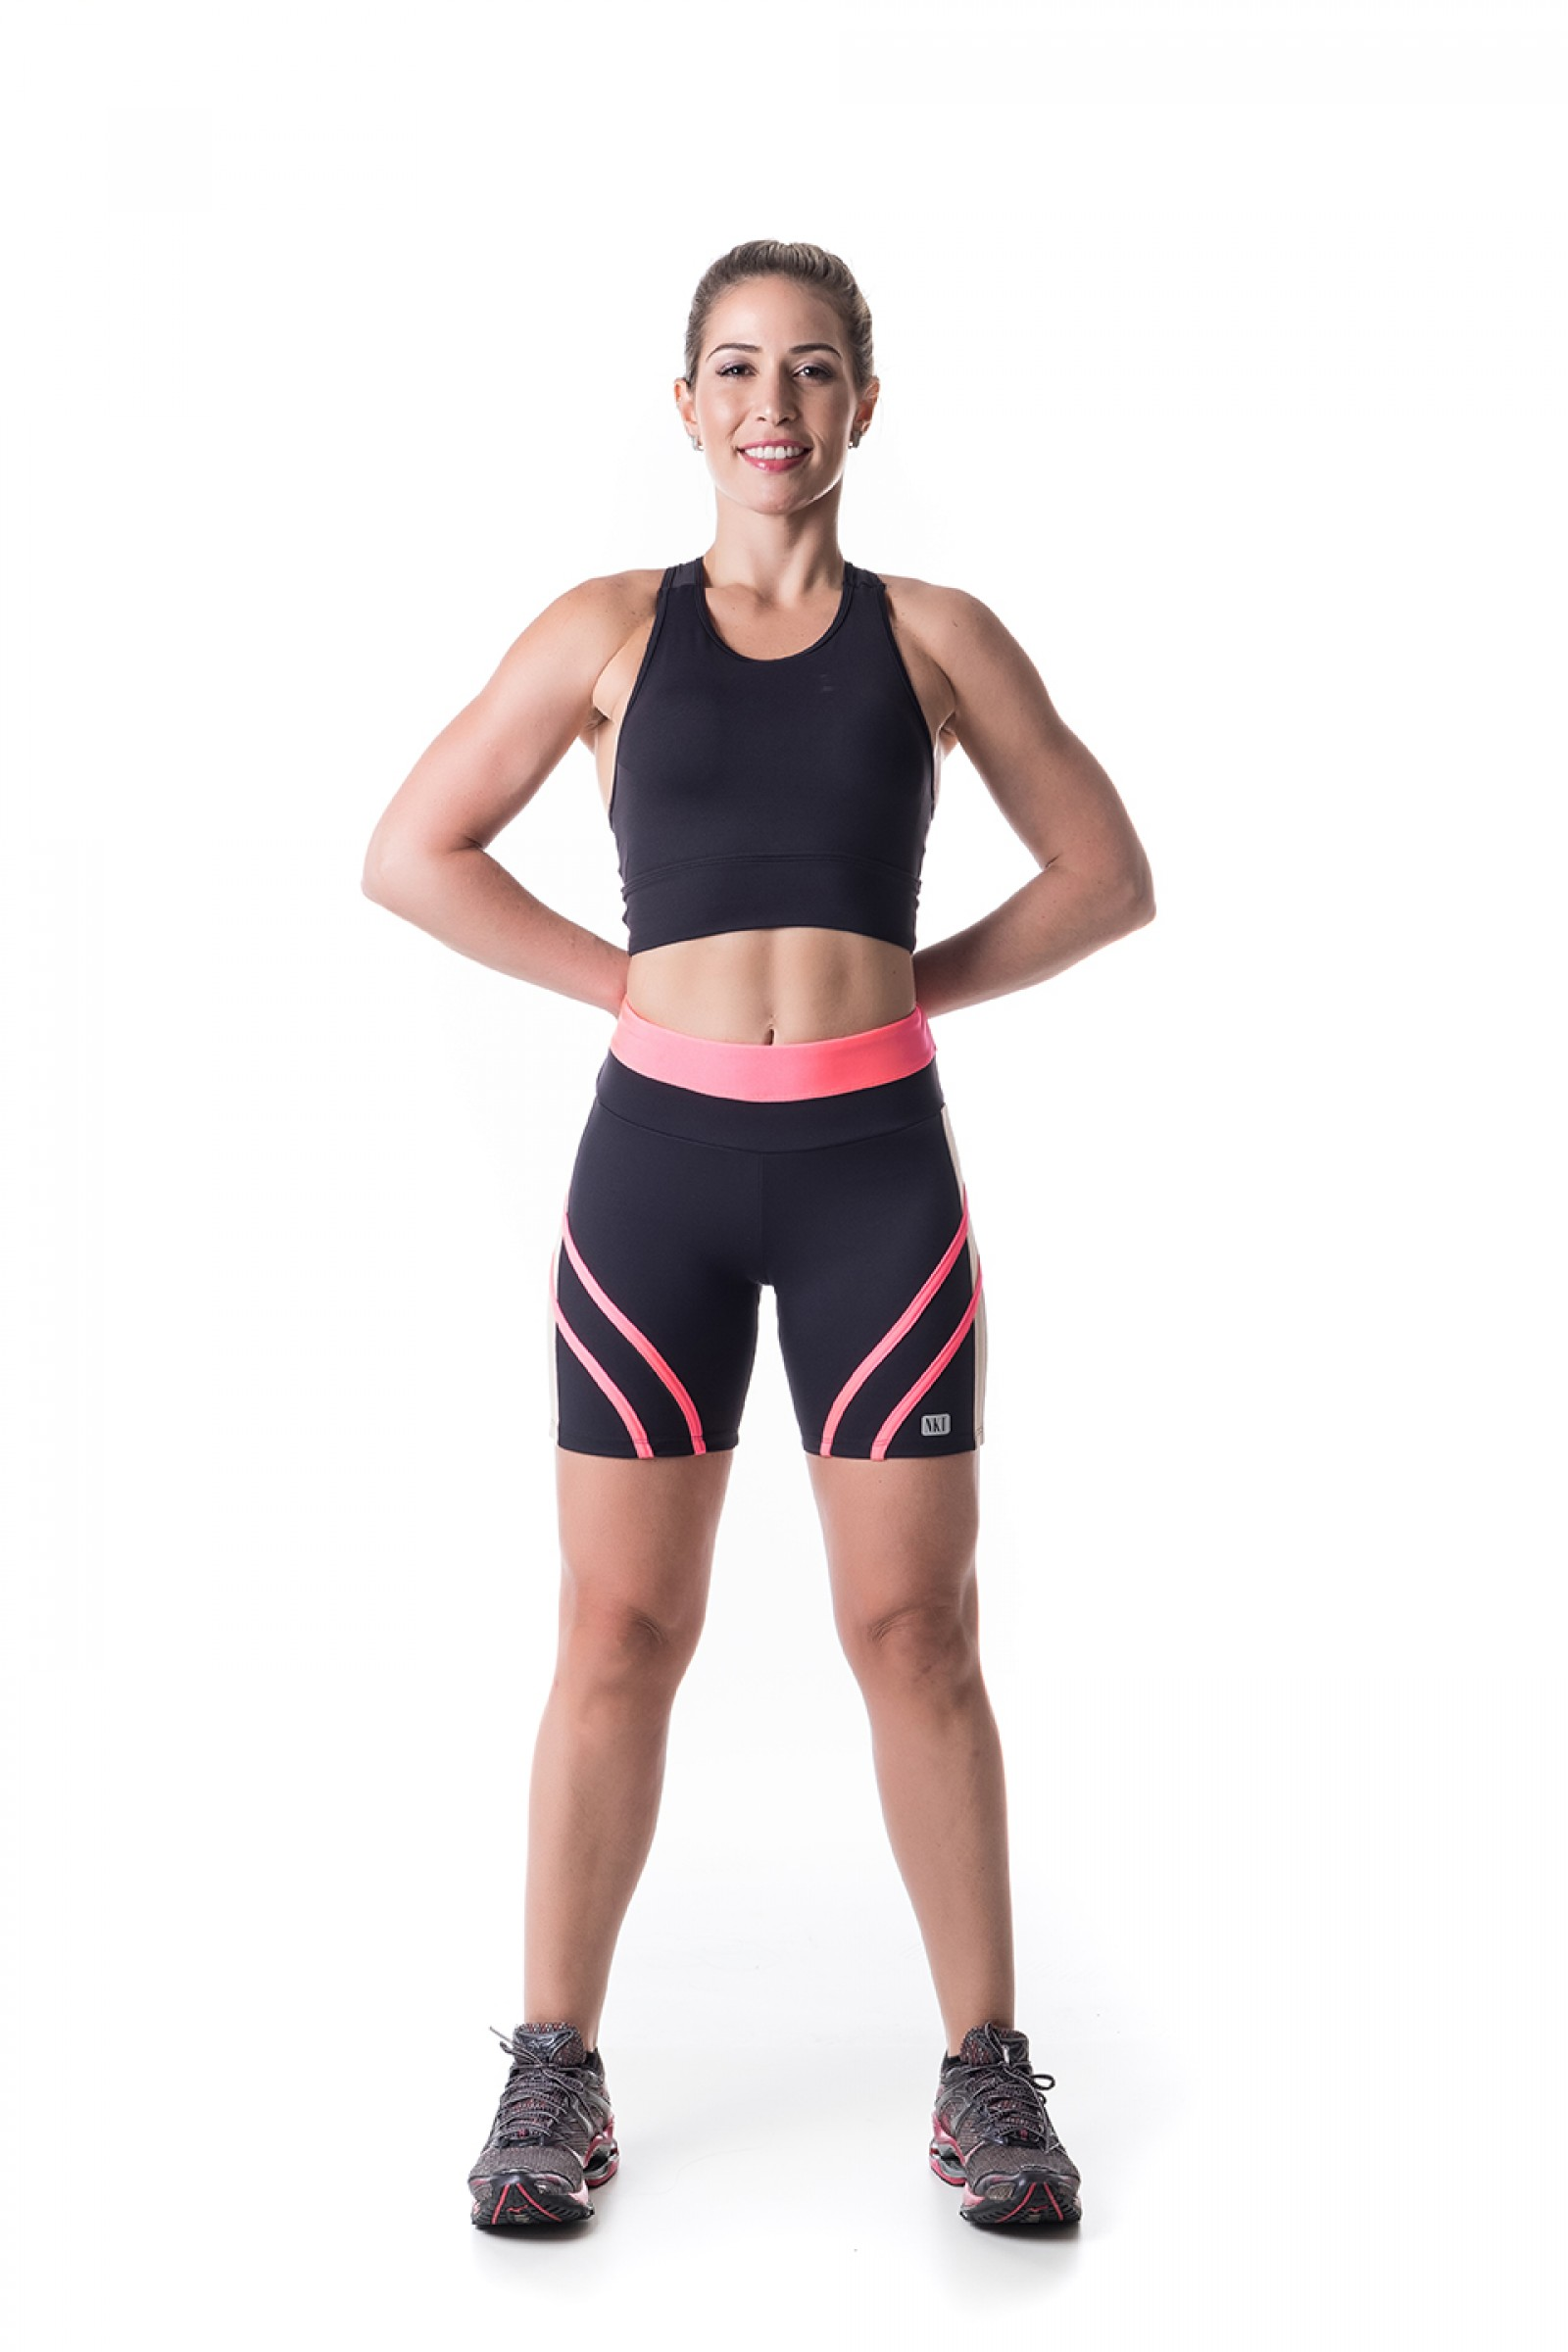 Bermuda Transform Glow, Coleção Challenge - NKT Fitwear Moda Fitness